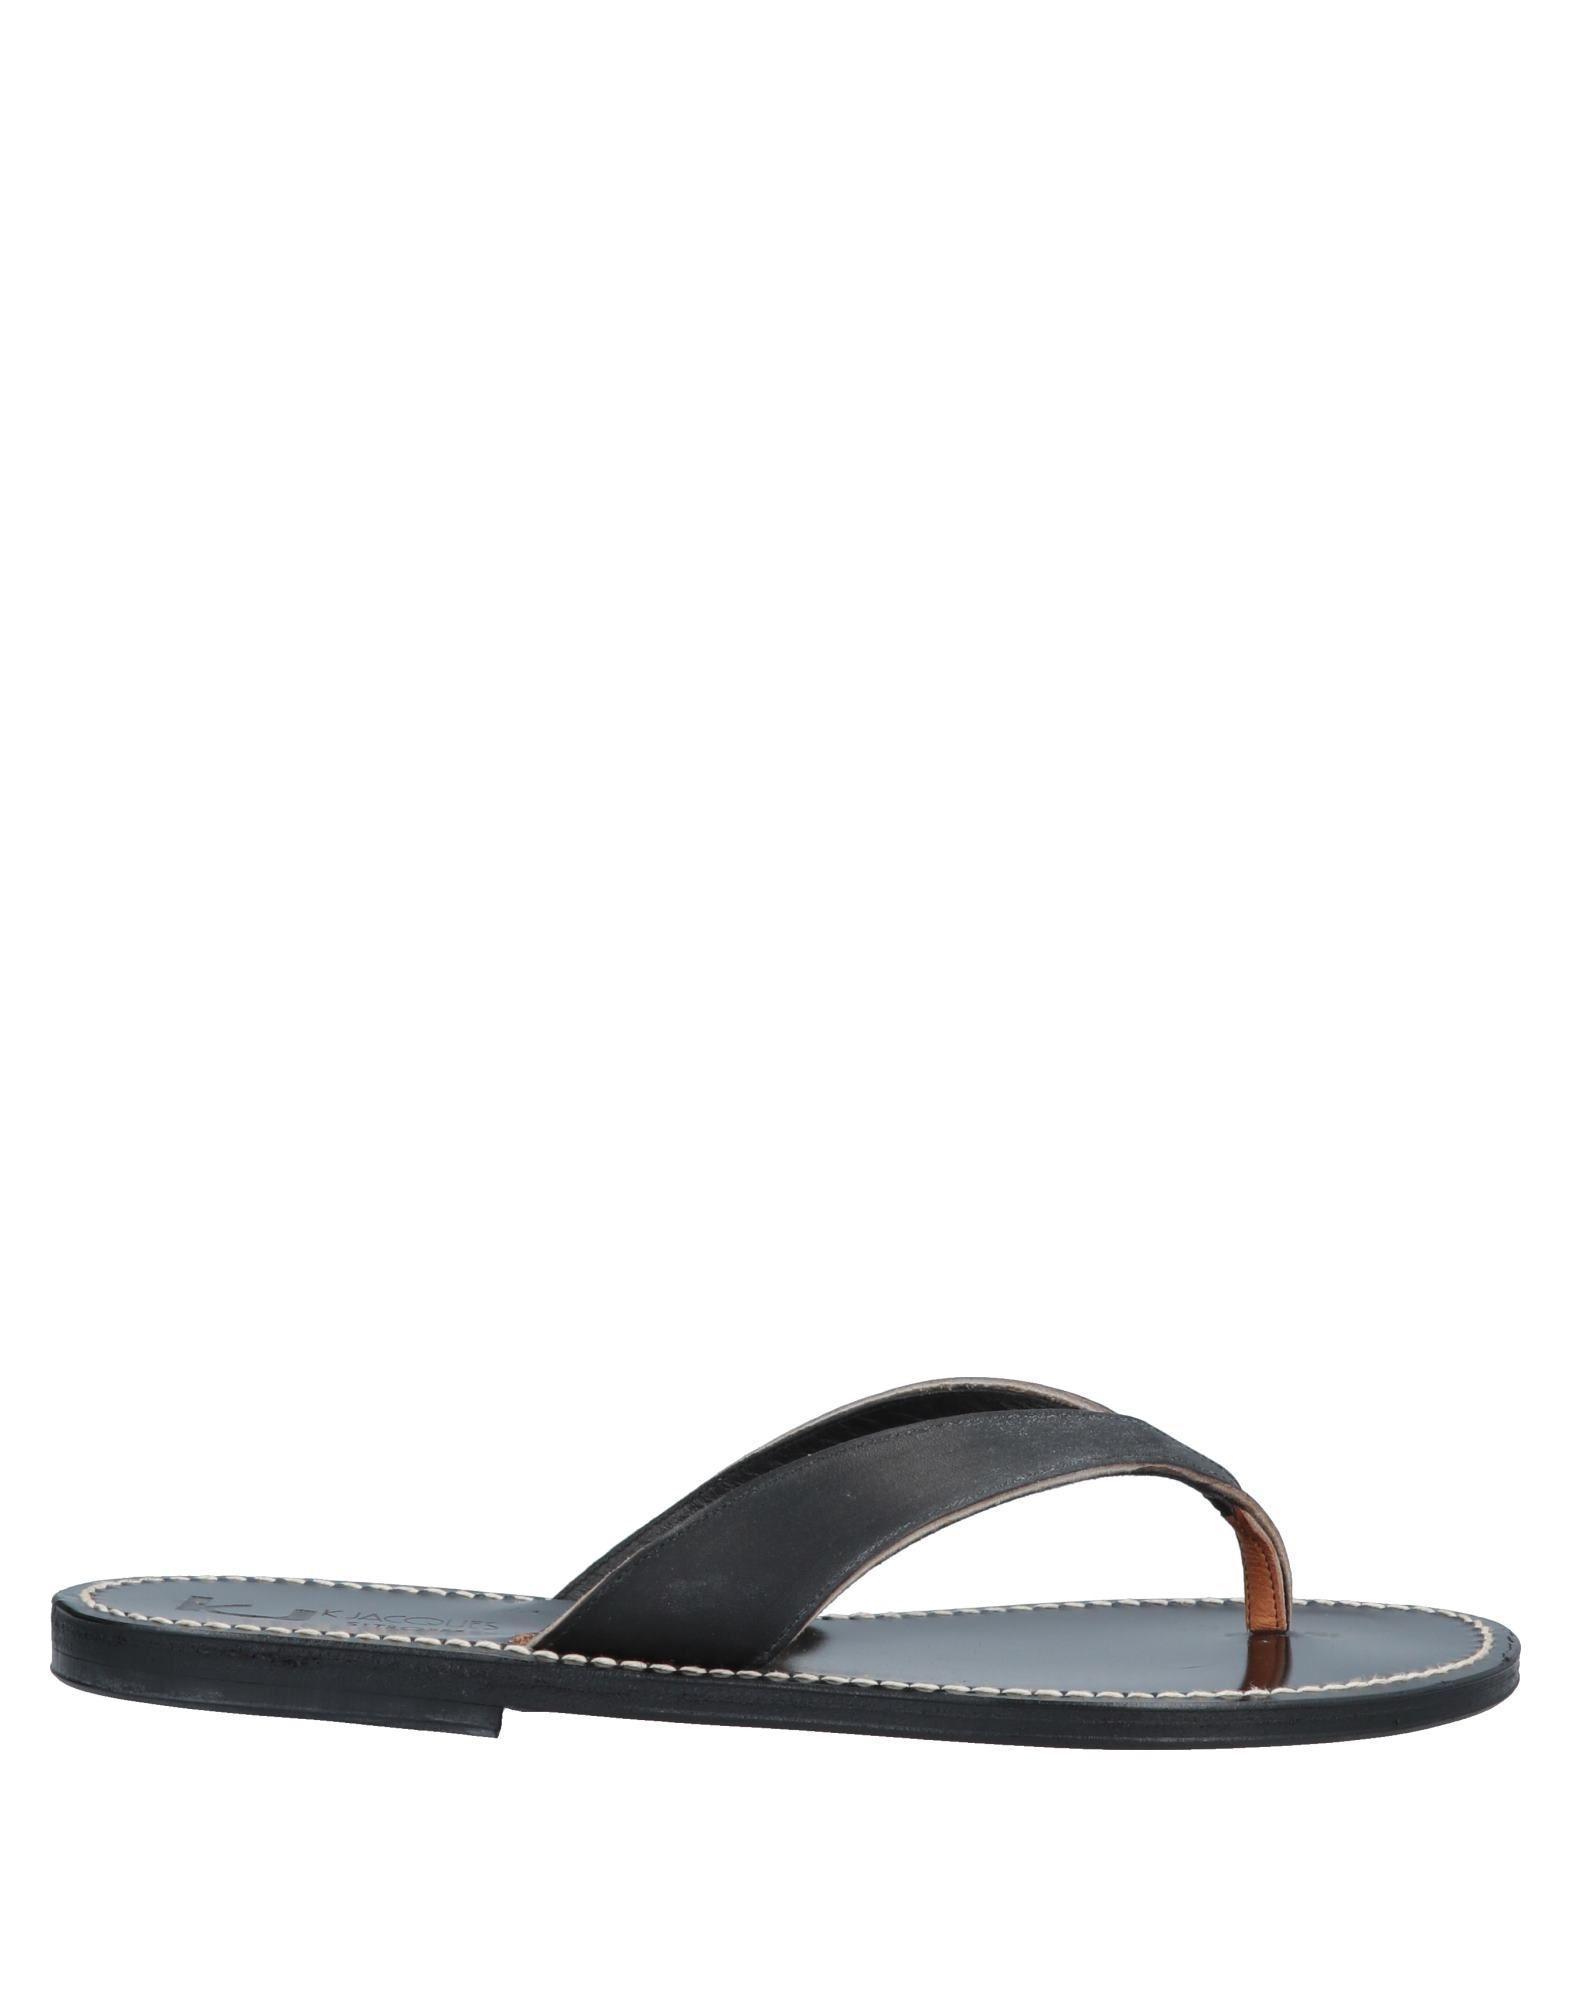 b392314cea86c Lyst - K. Jacques Toe Post Sandal in Black for Men